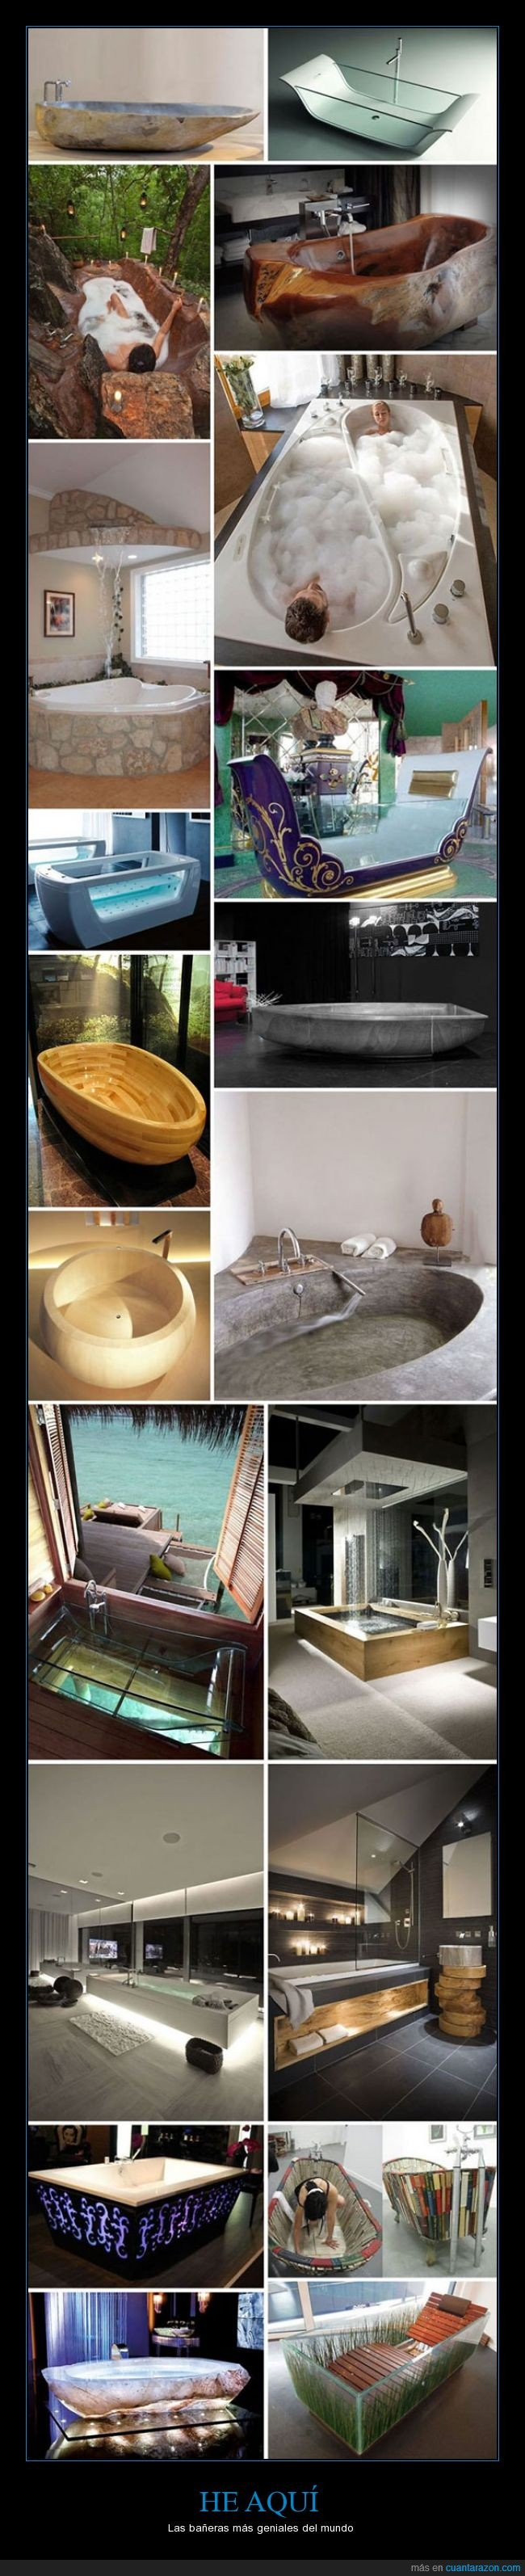 bañera,baño,ducha,lavabo,lujo